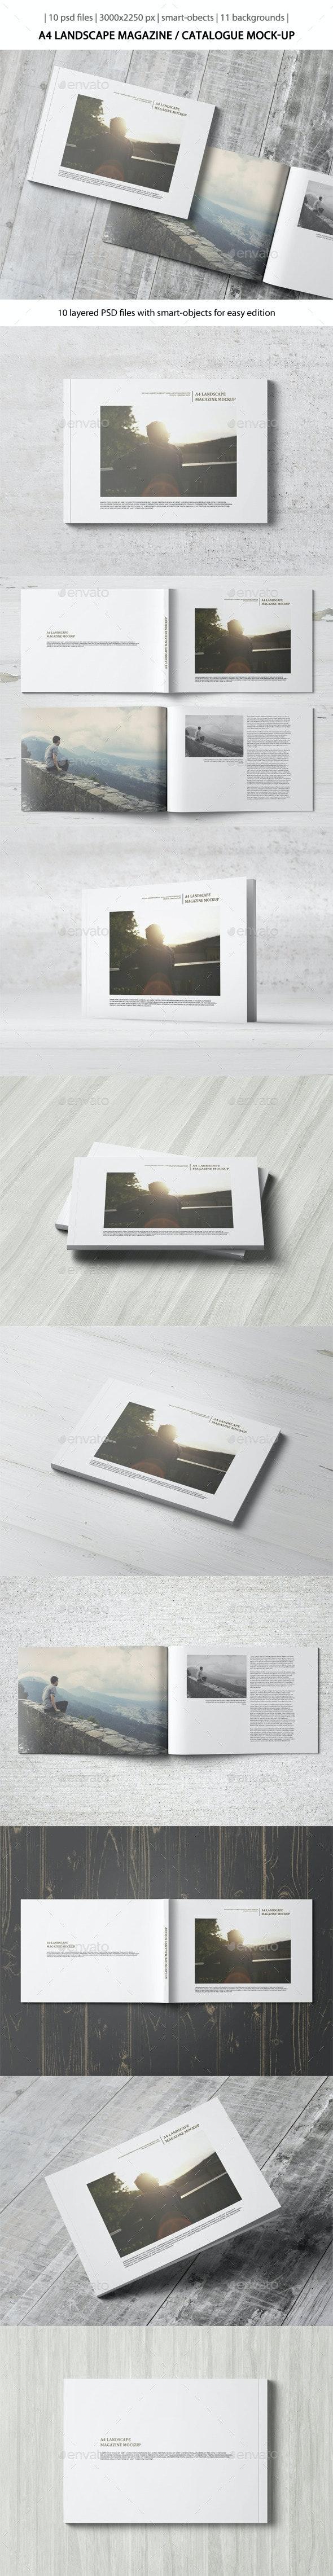 A4 Landscape Magazine / Catalogue Mock-Up - Magazines Print